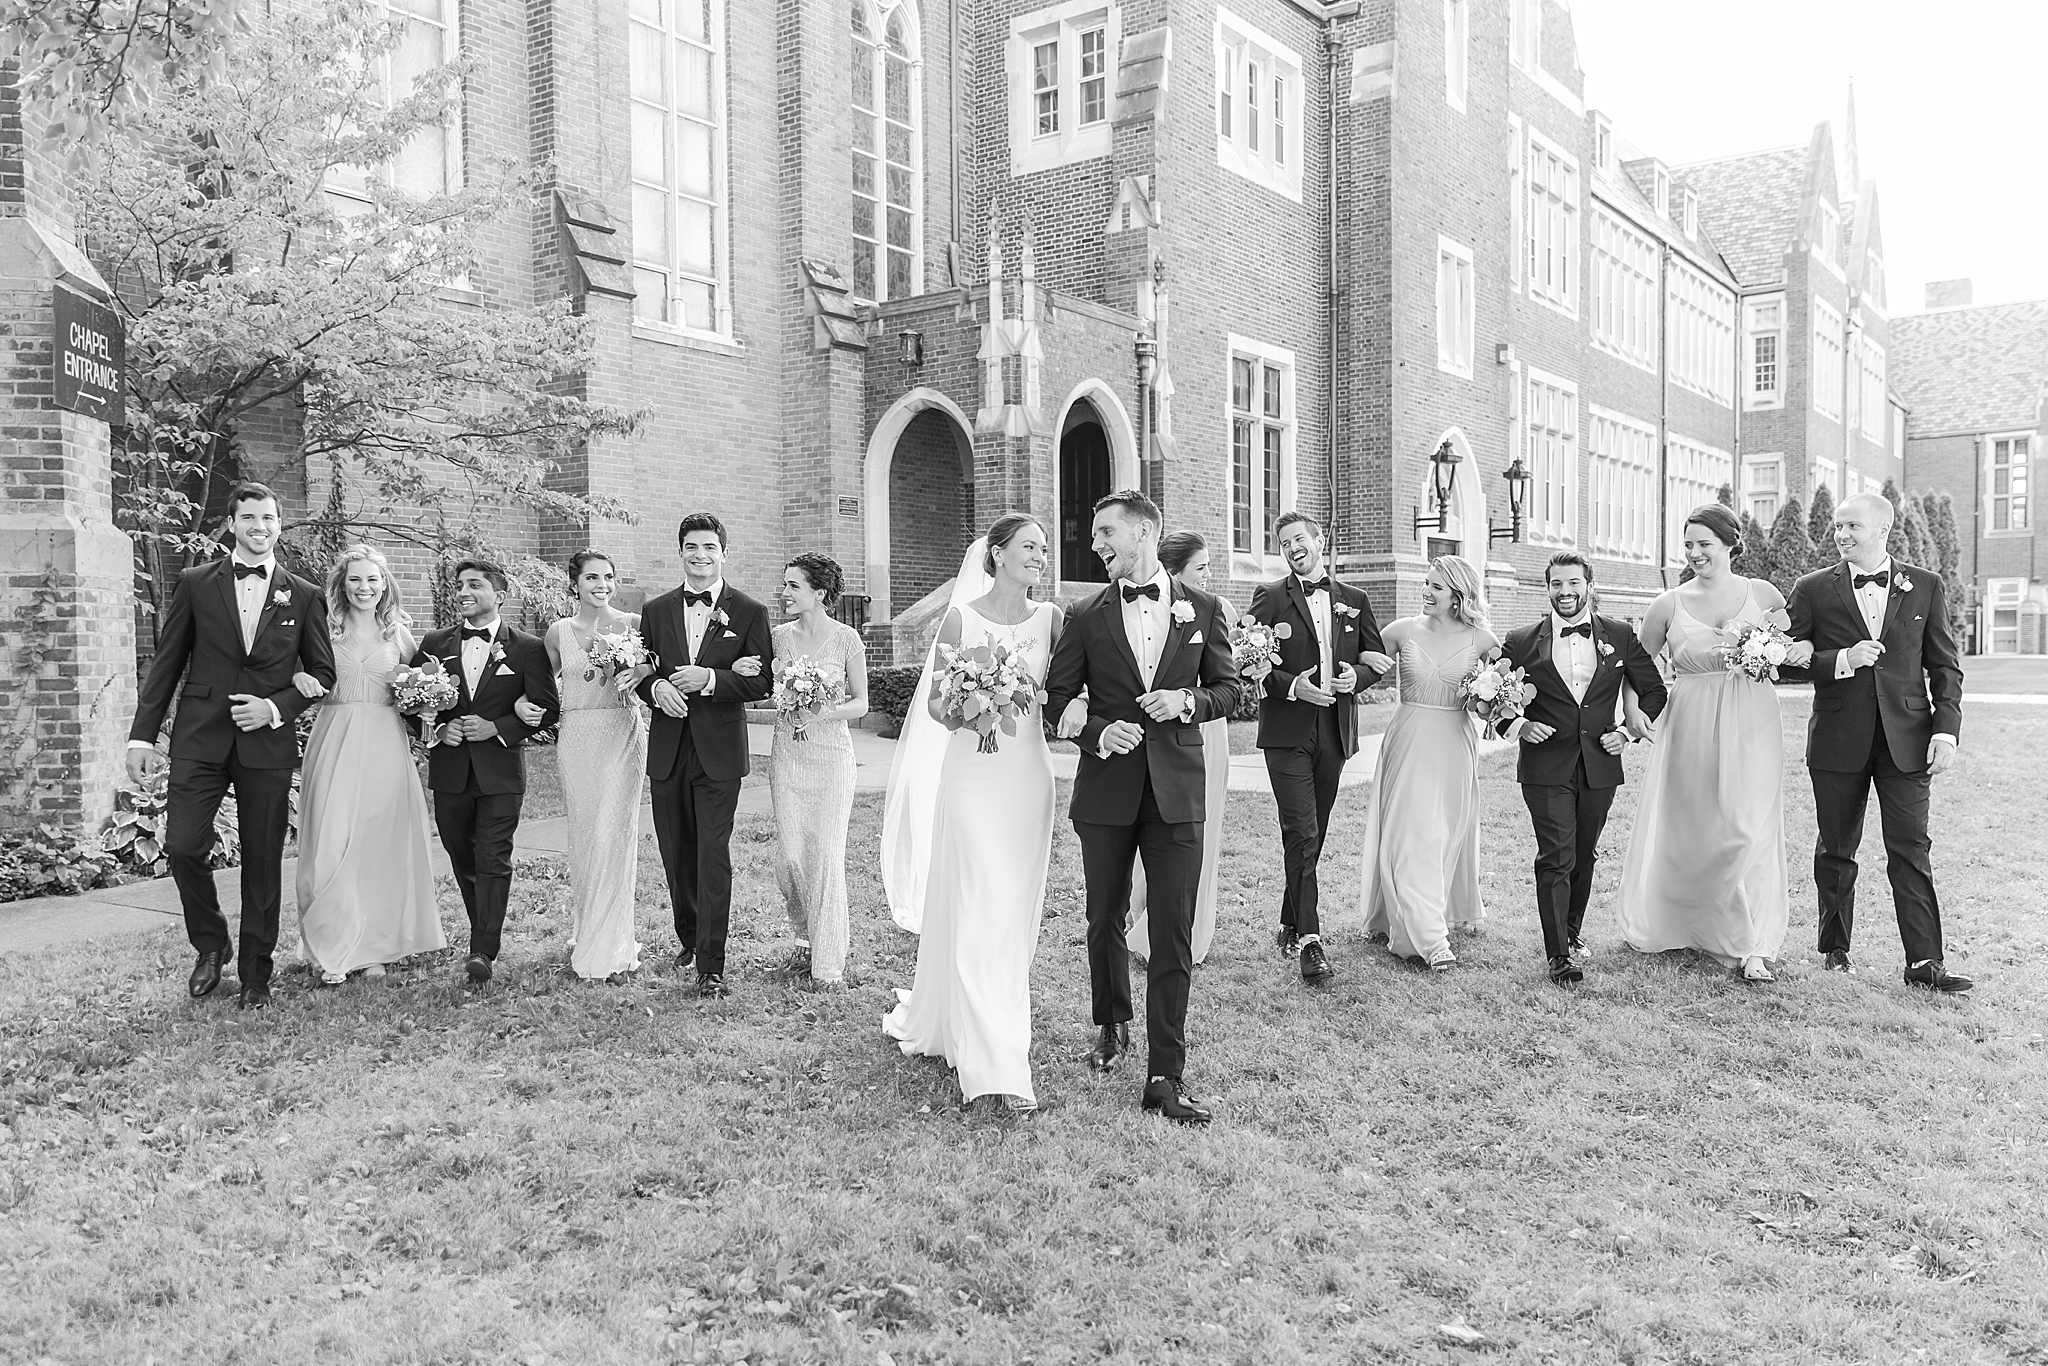 detroit-wedding-photographer-grosse-pointe-academy-chapel-detroit-golf-club-wedding-carly-matt-by-courtney-carolyn-photography_0062.jpg